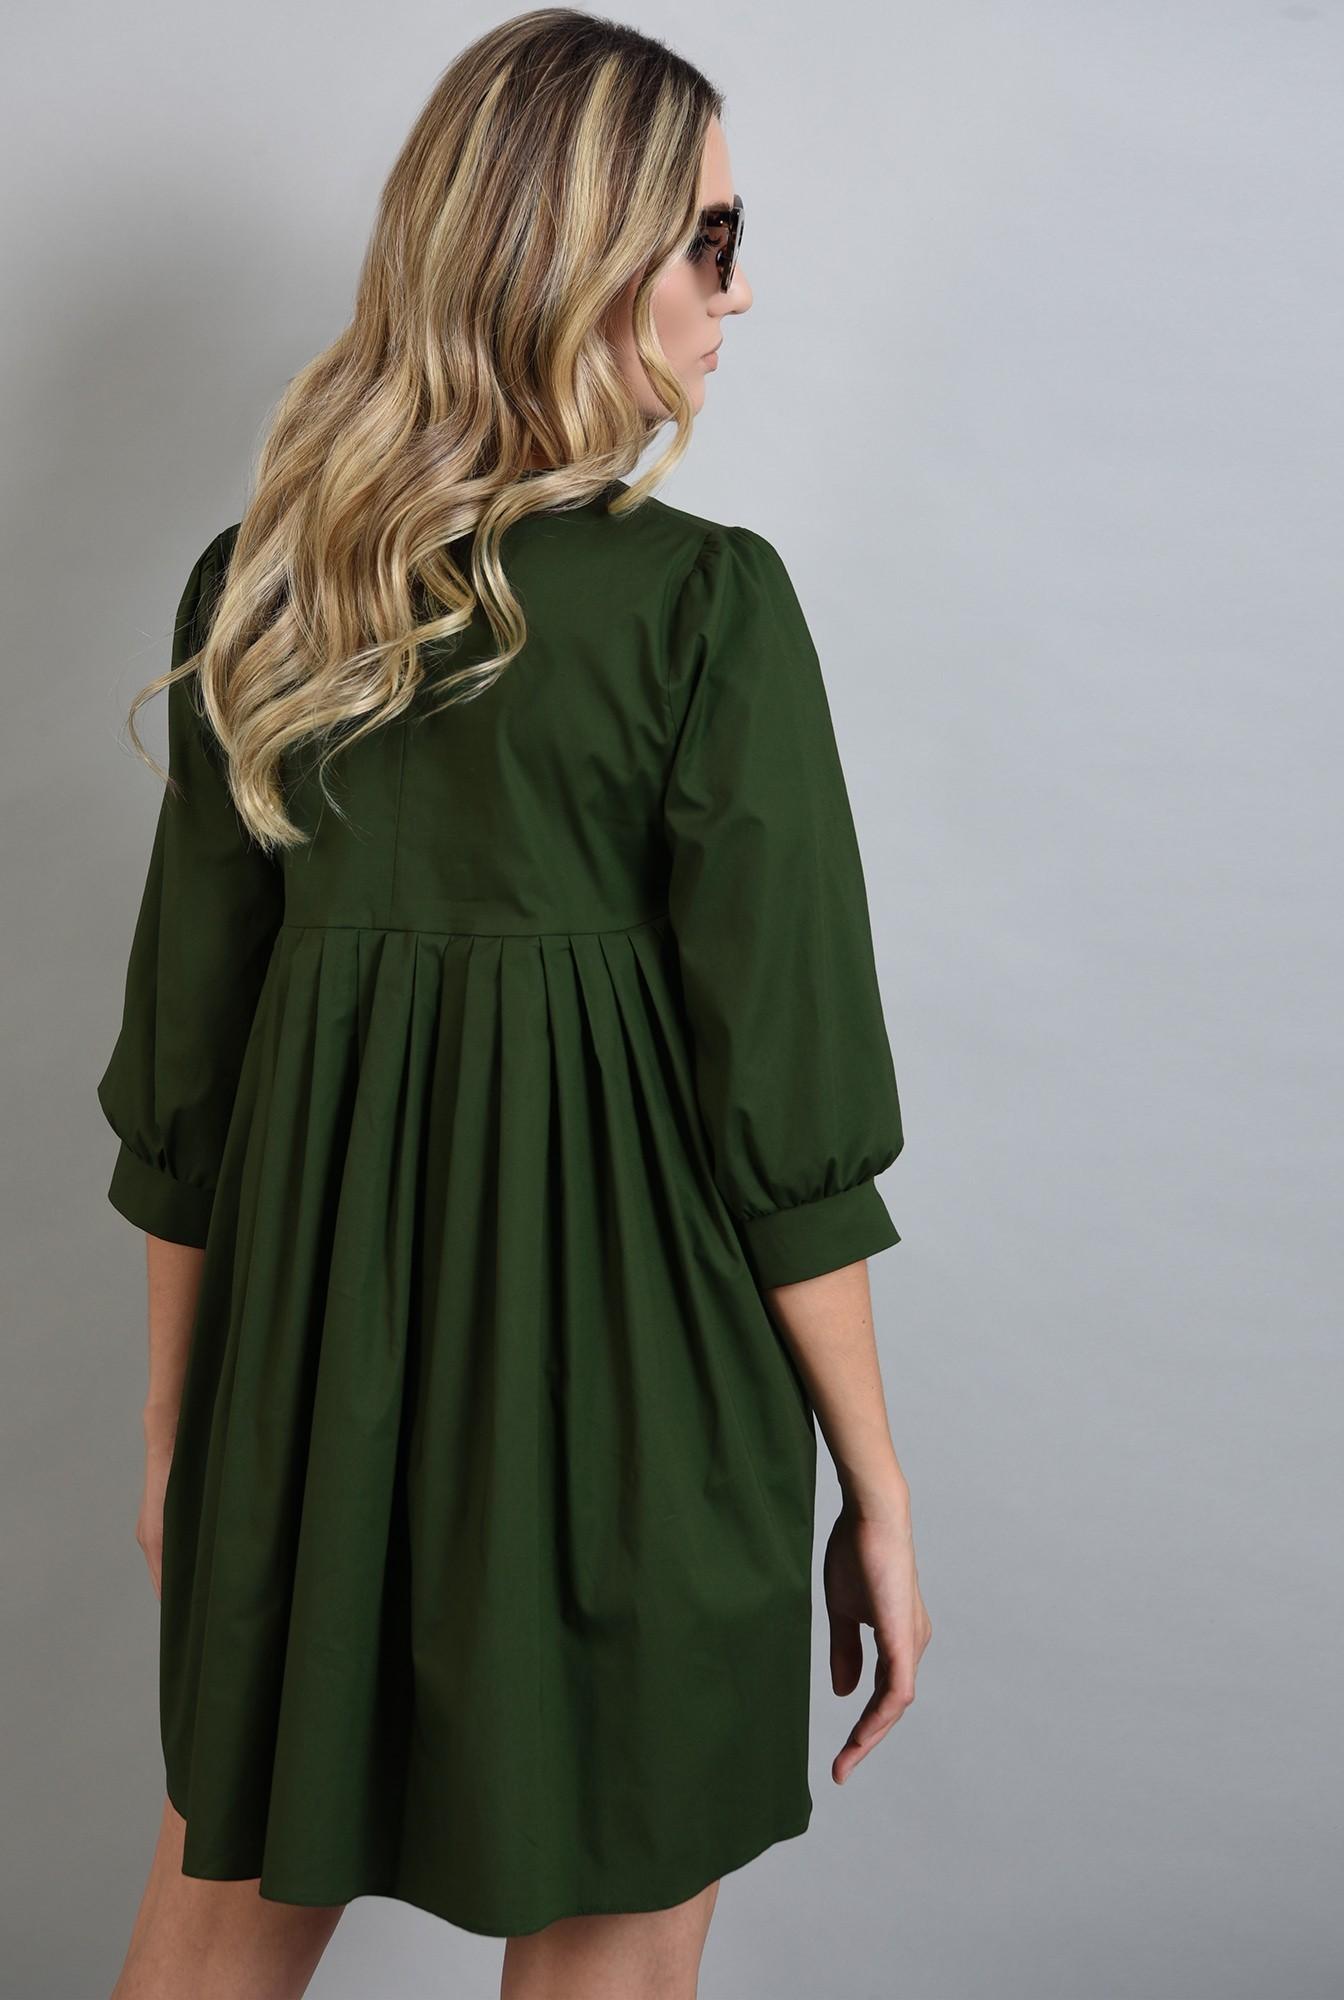 1 - rochie verde scurta, cu pliuri, Poema